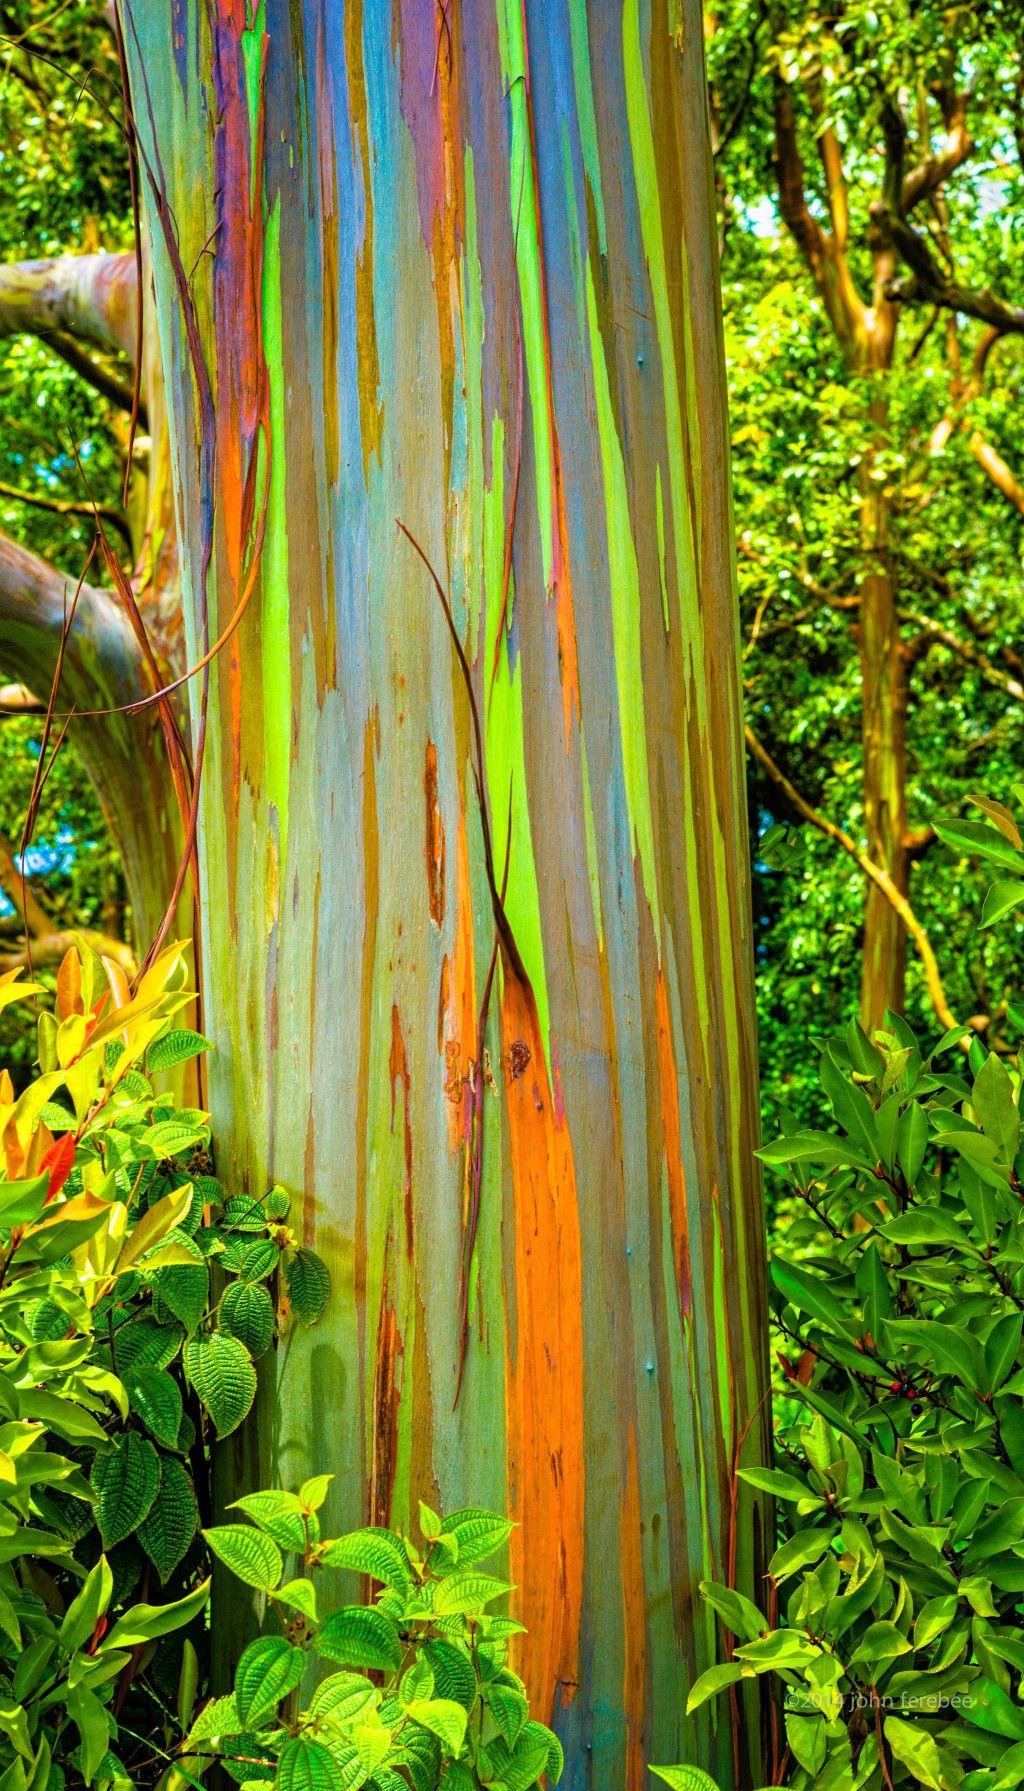 rainbow eucalyptus | Trees | Bark, Branches, Leaves & Form ...